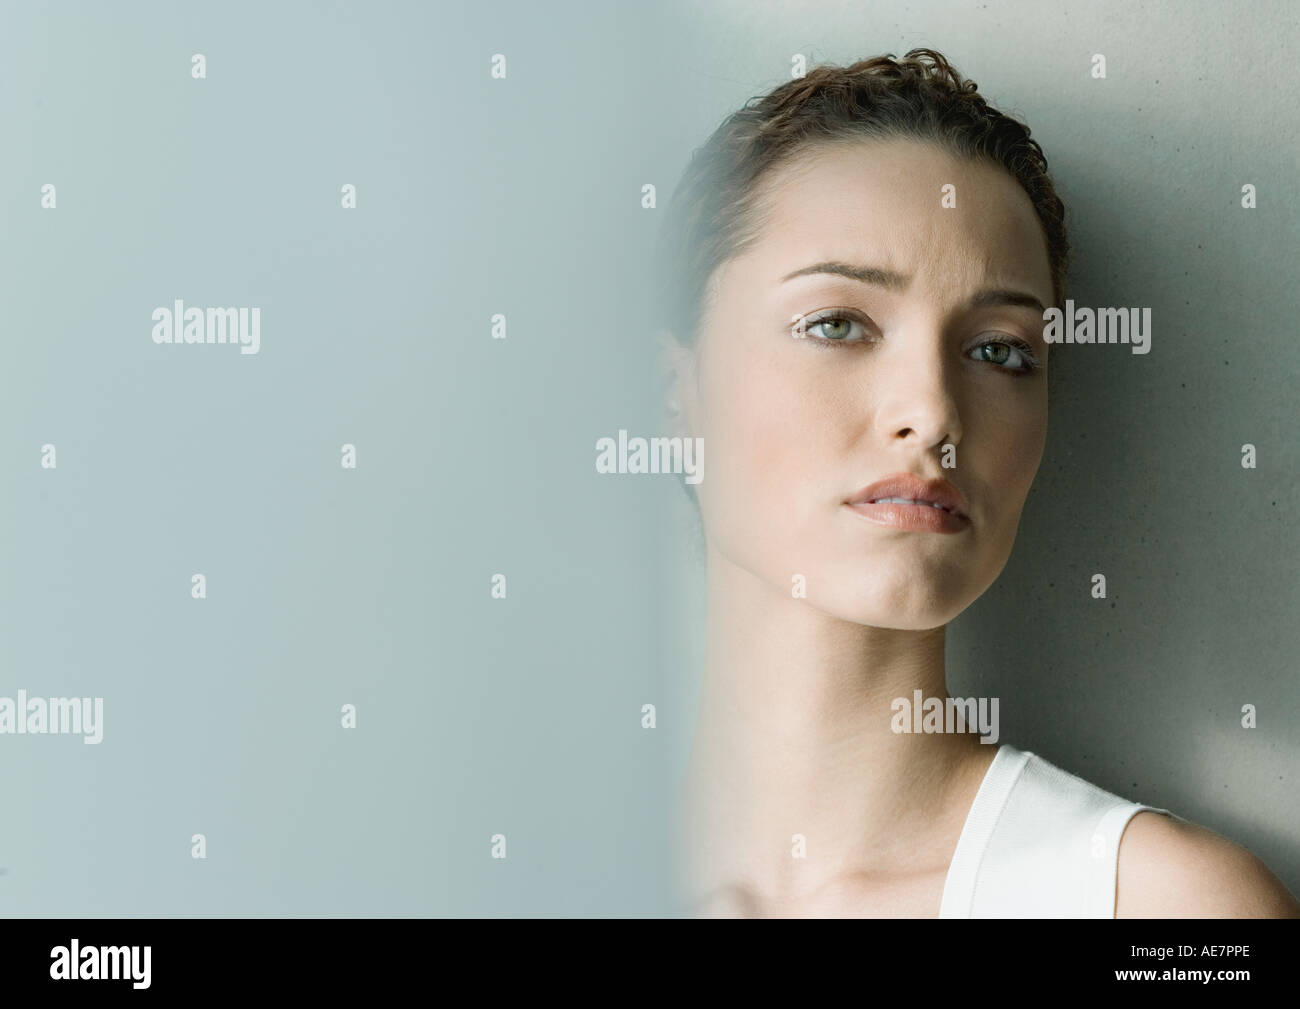 Woman furrowing brow - Stock Image